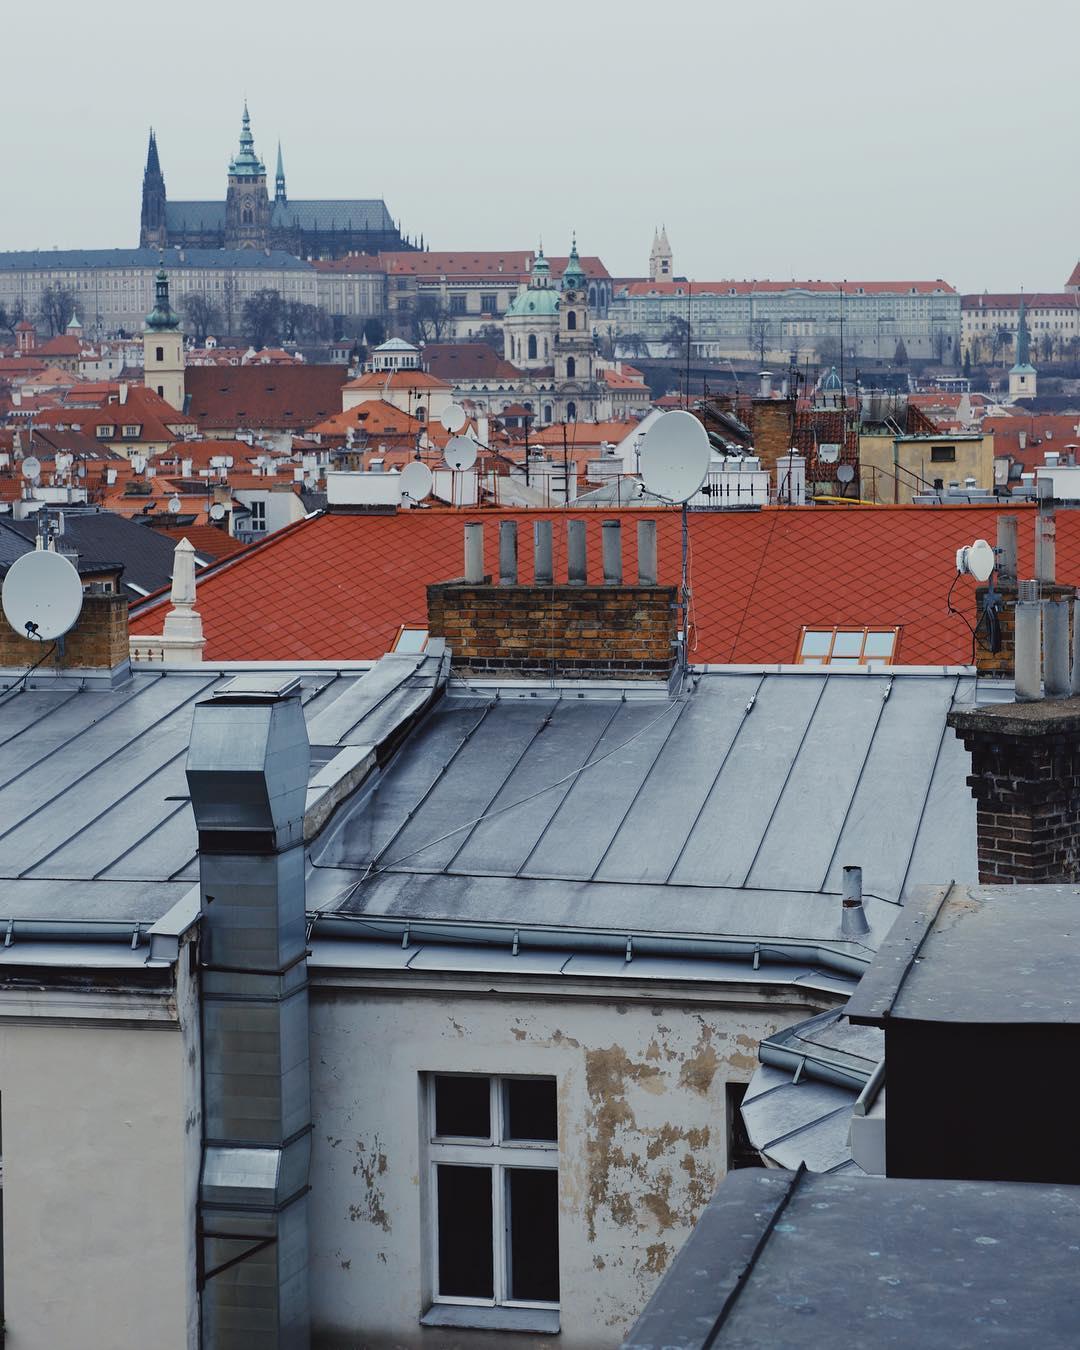 Polina-Shubkina-Prague-Photographer-009.jpeg